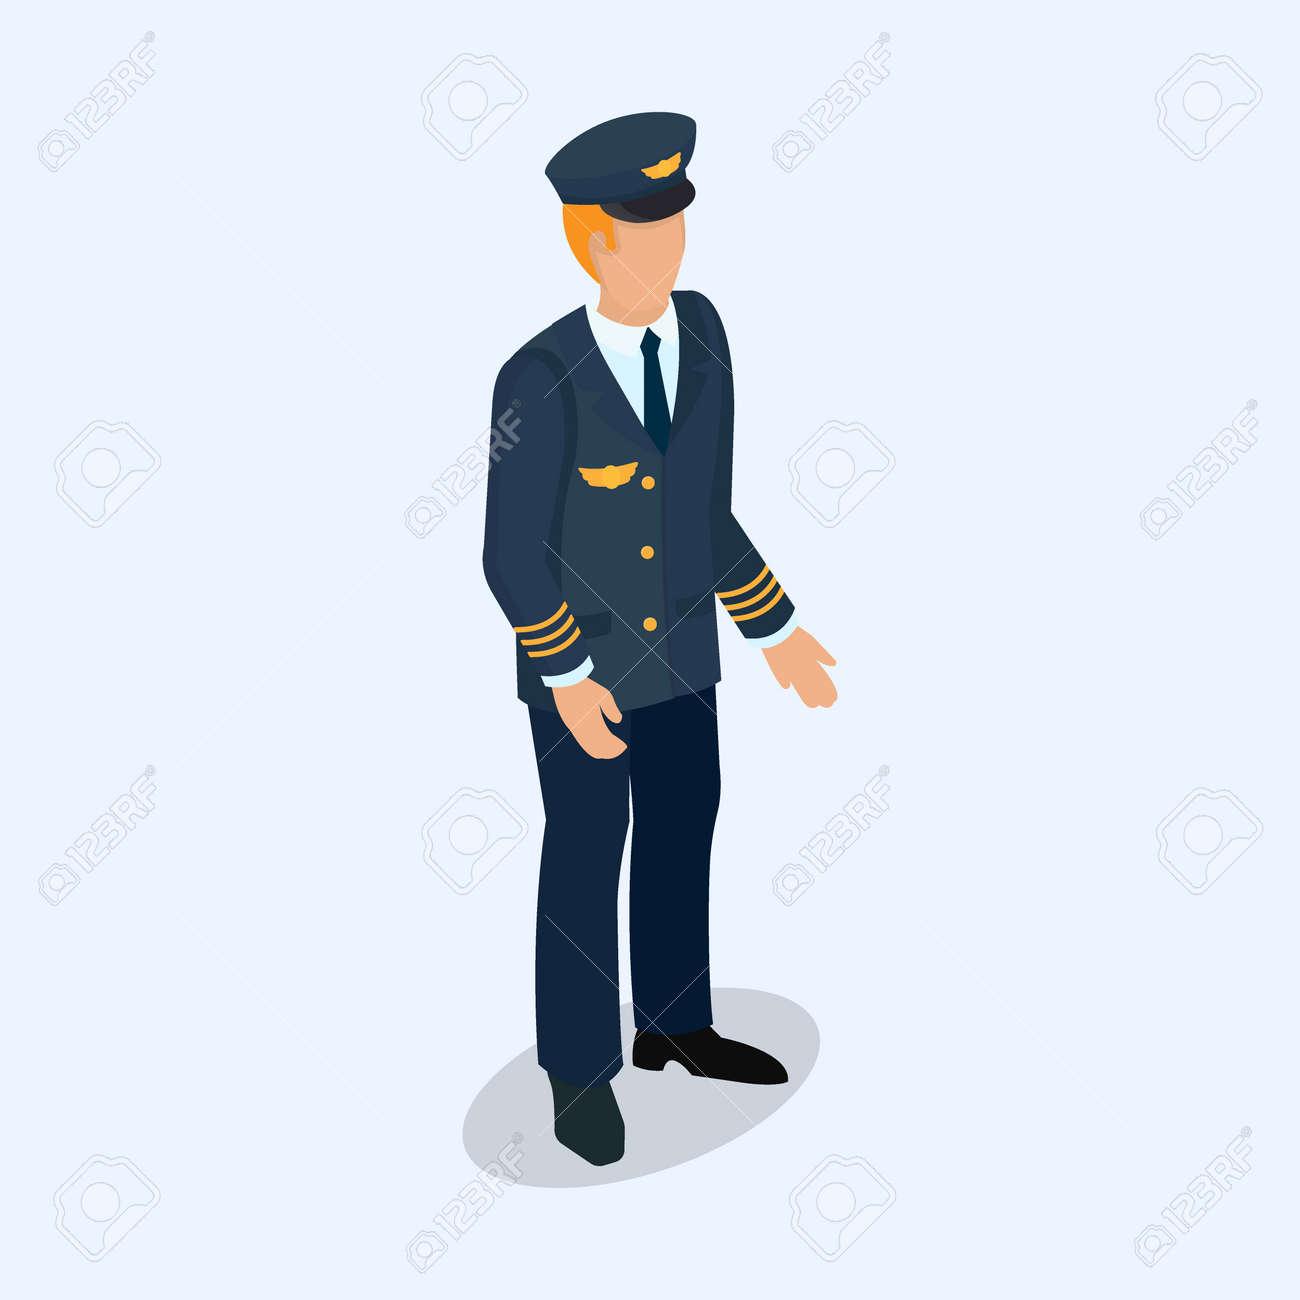 d3b1aed9c1 Aviador, Piloto, Figura, Aislado, En, Un, Luz, Plano De Fondo 3D ...